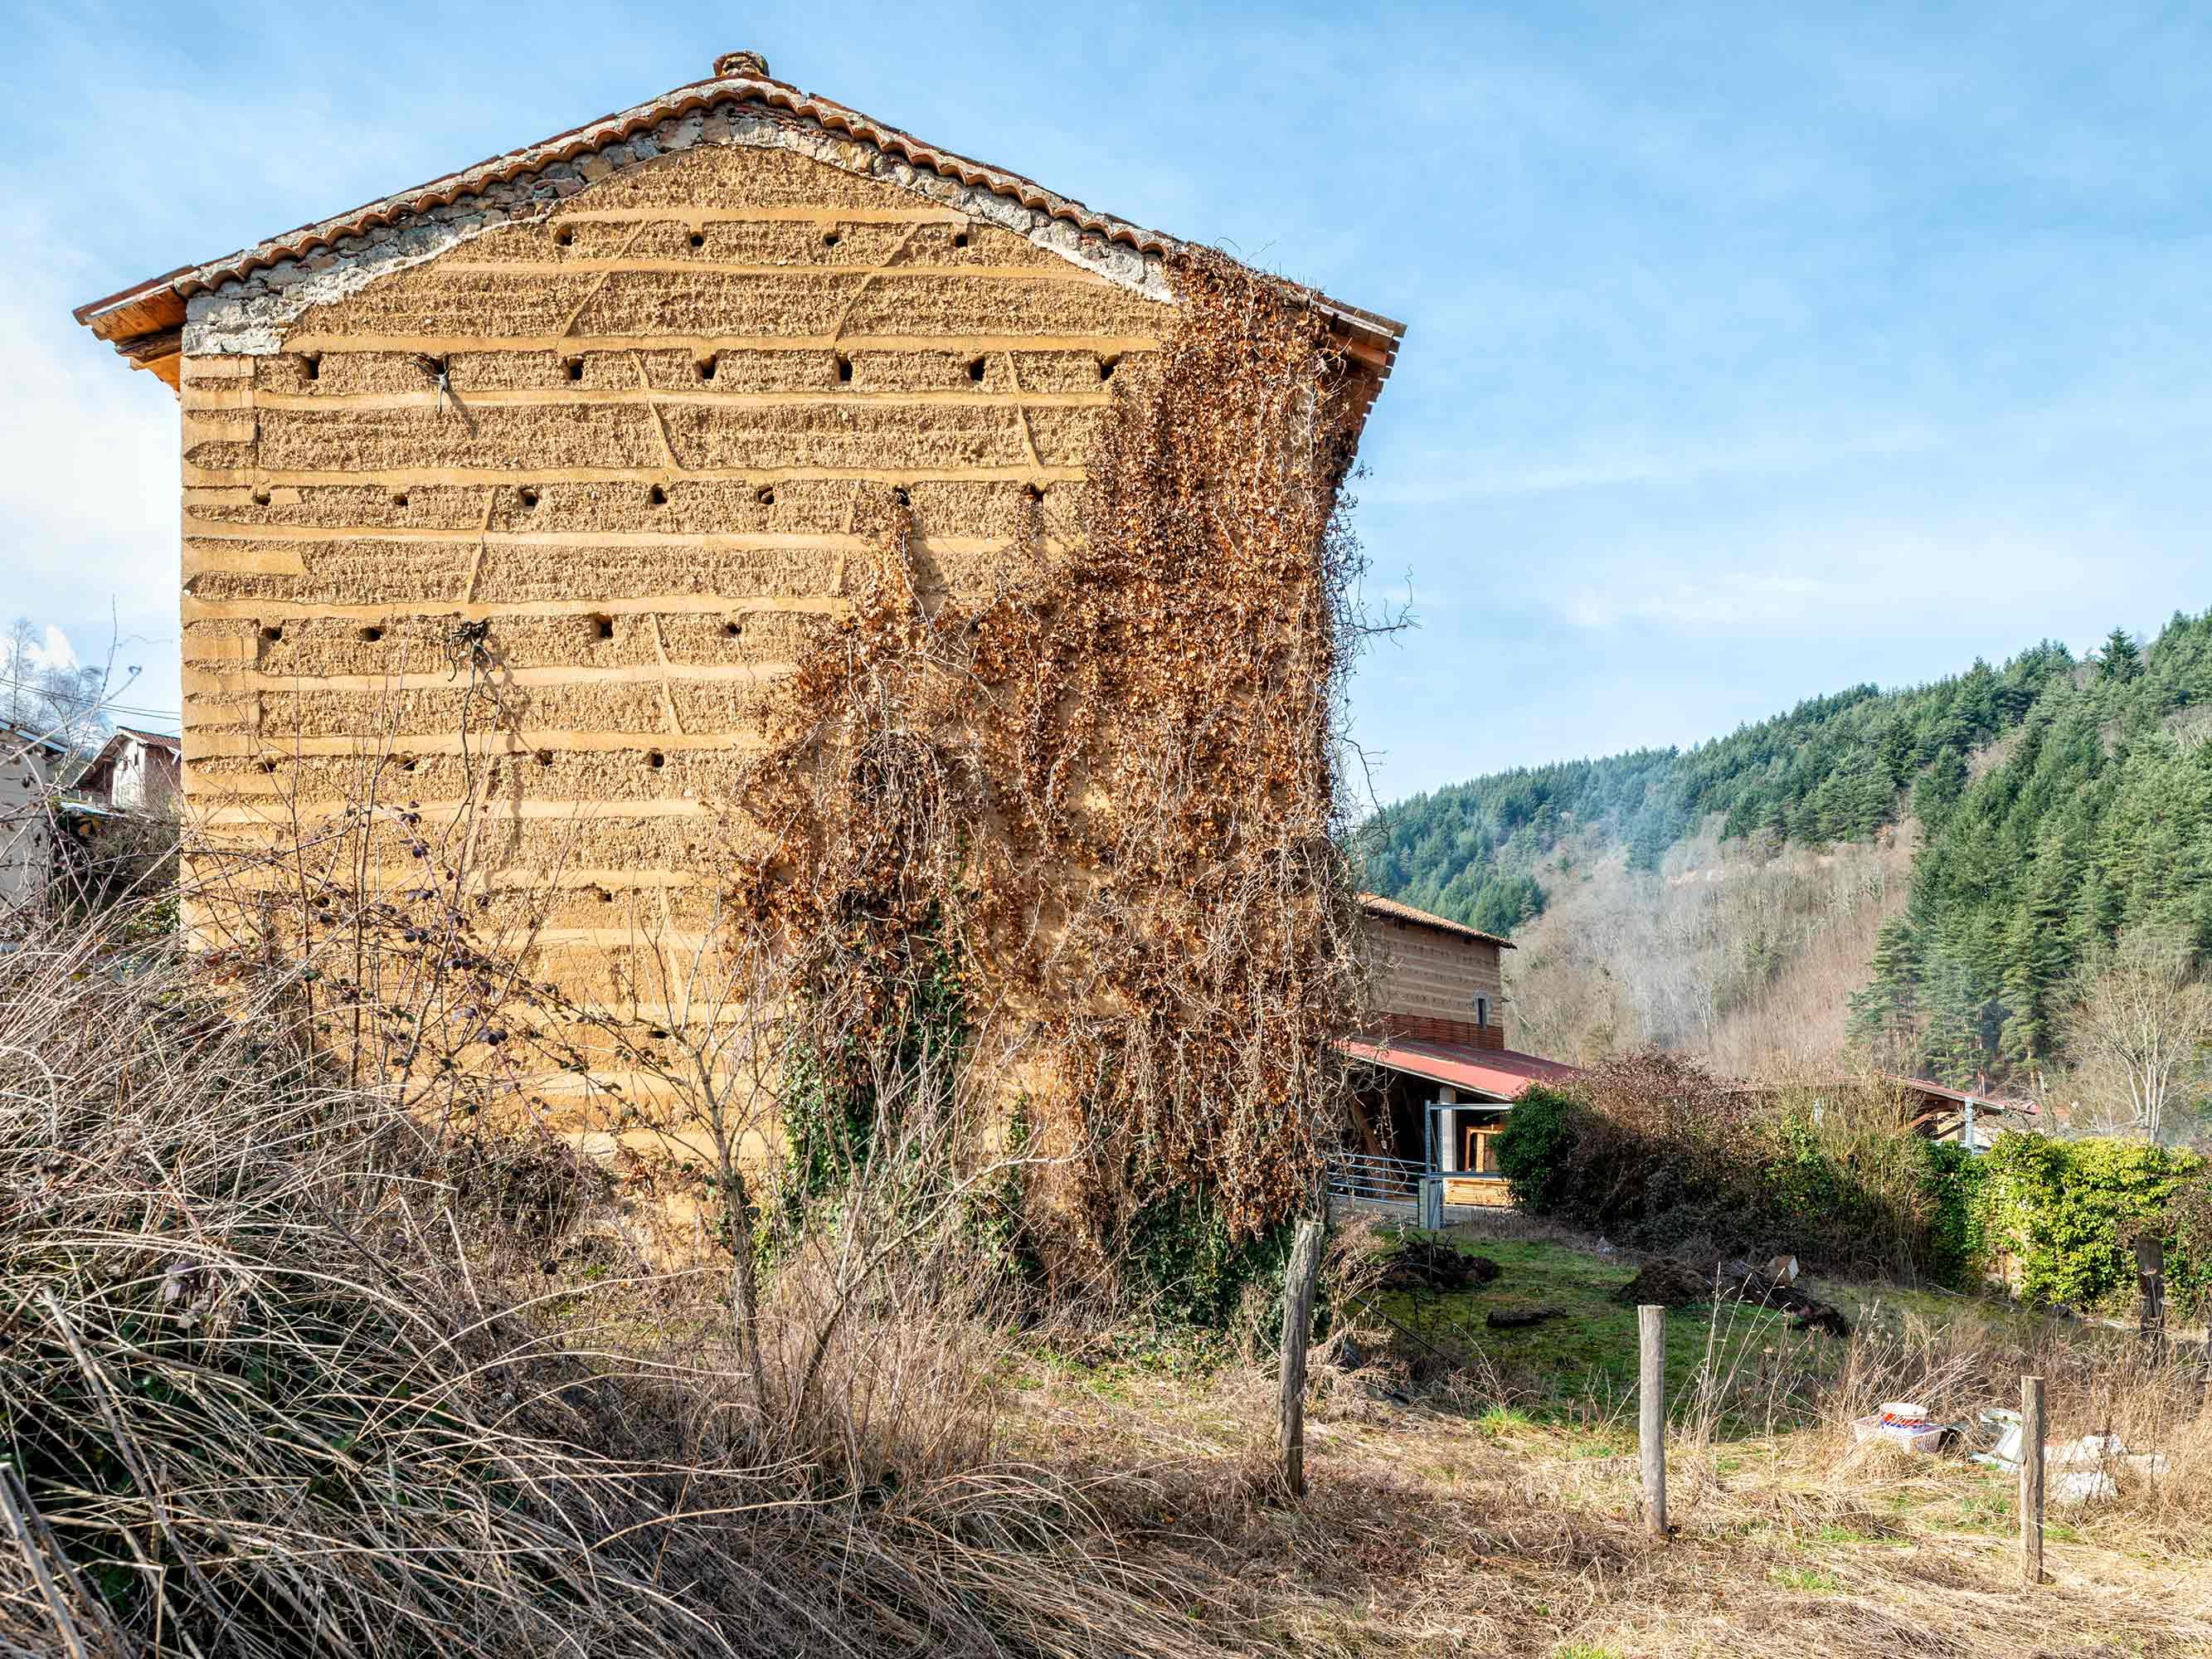 Pisé – Stampflehmbauten in Frankreich  453/7